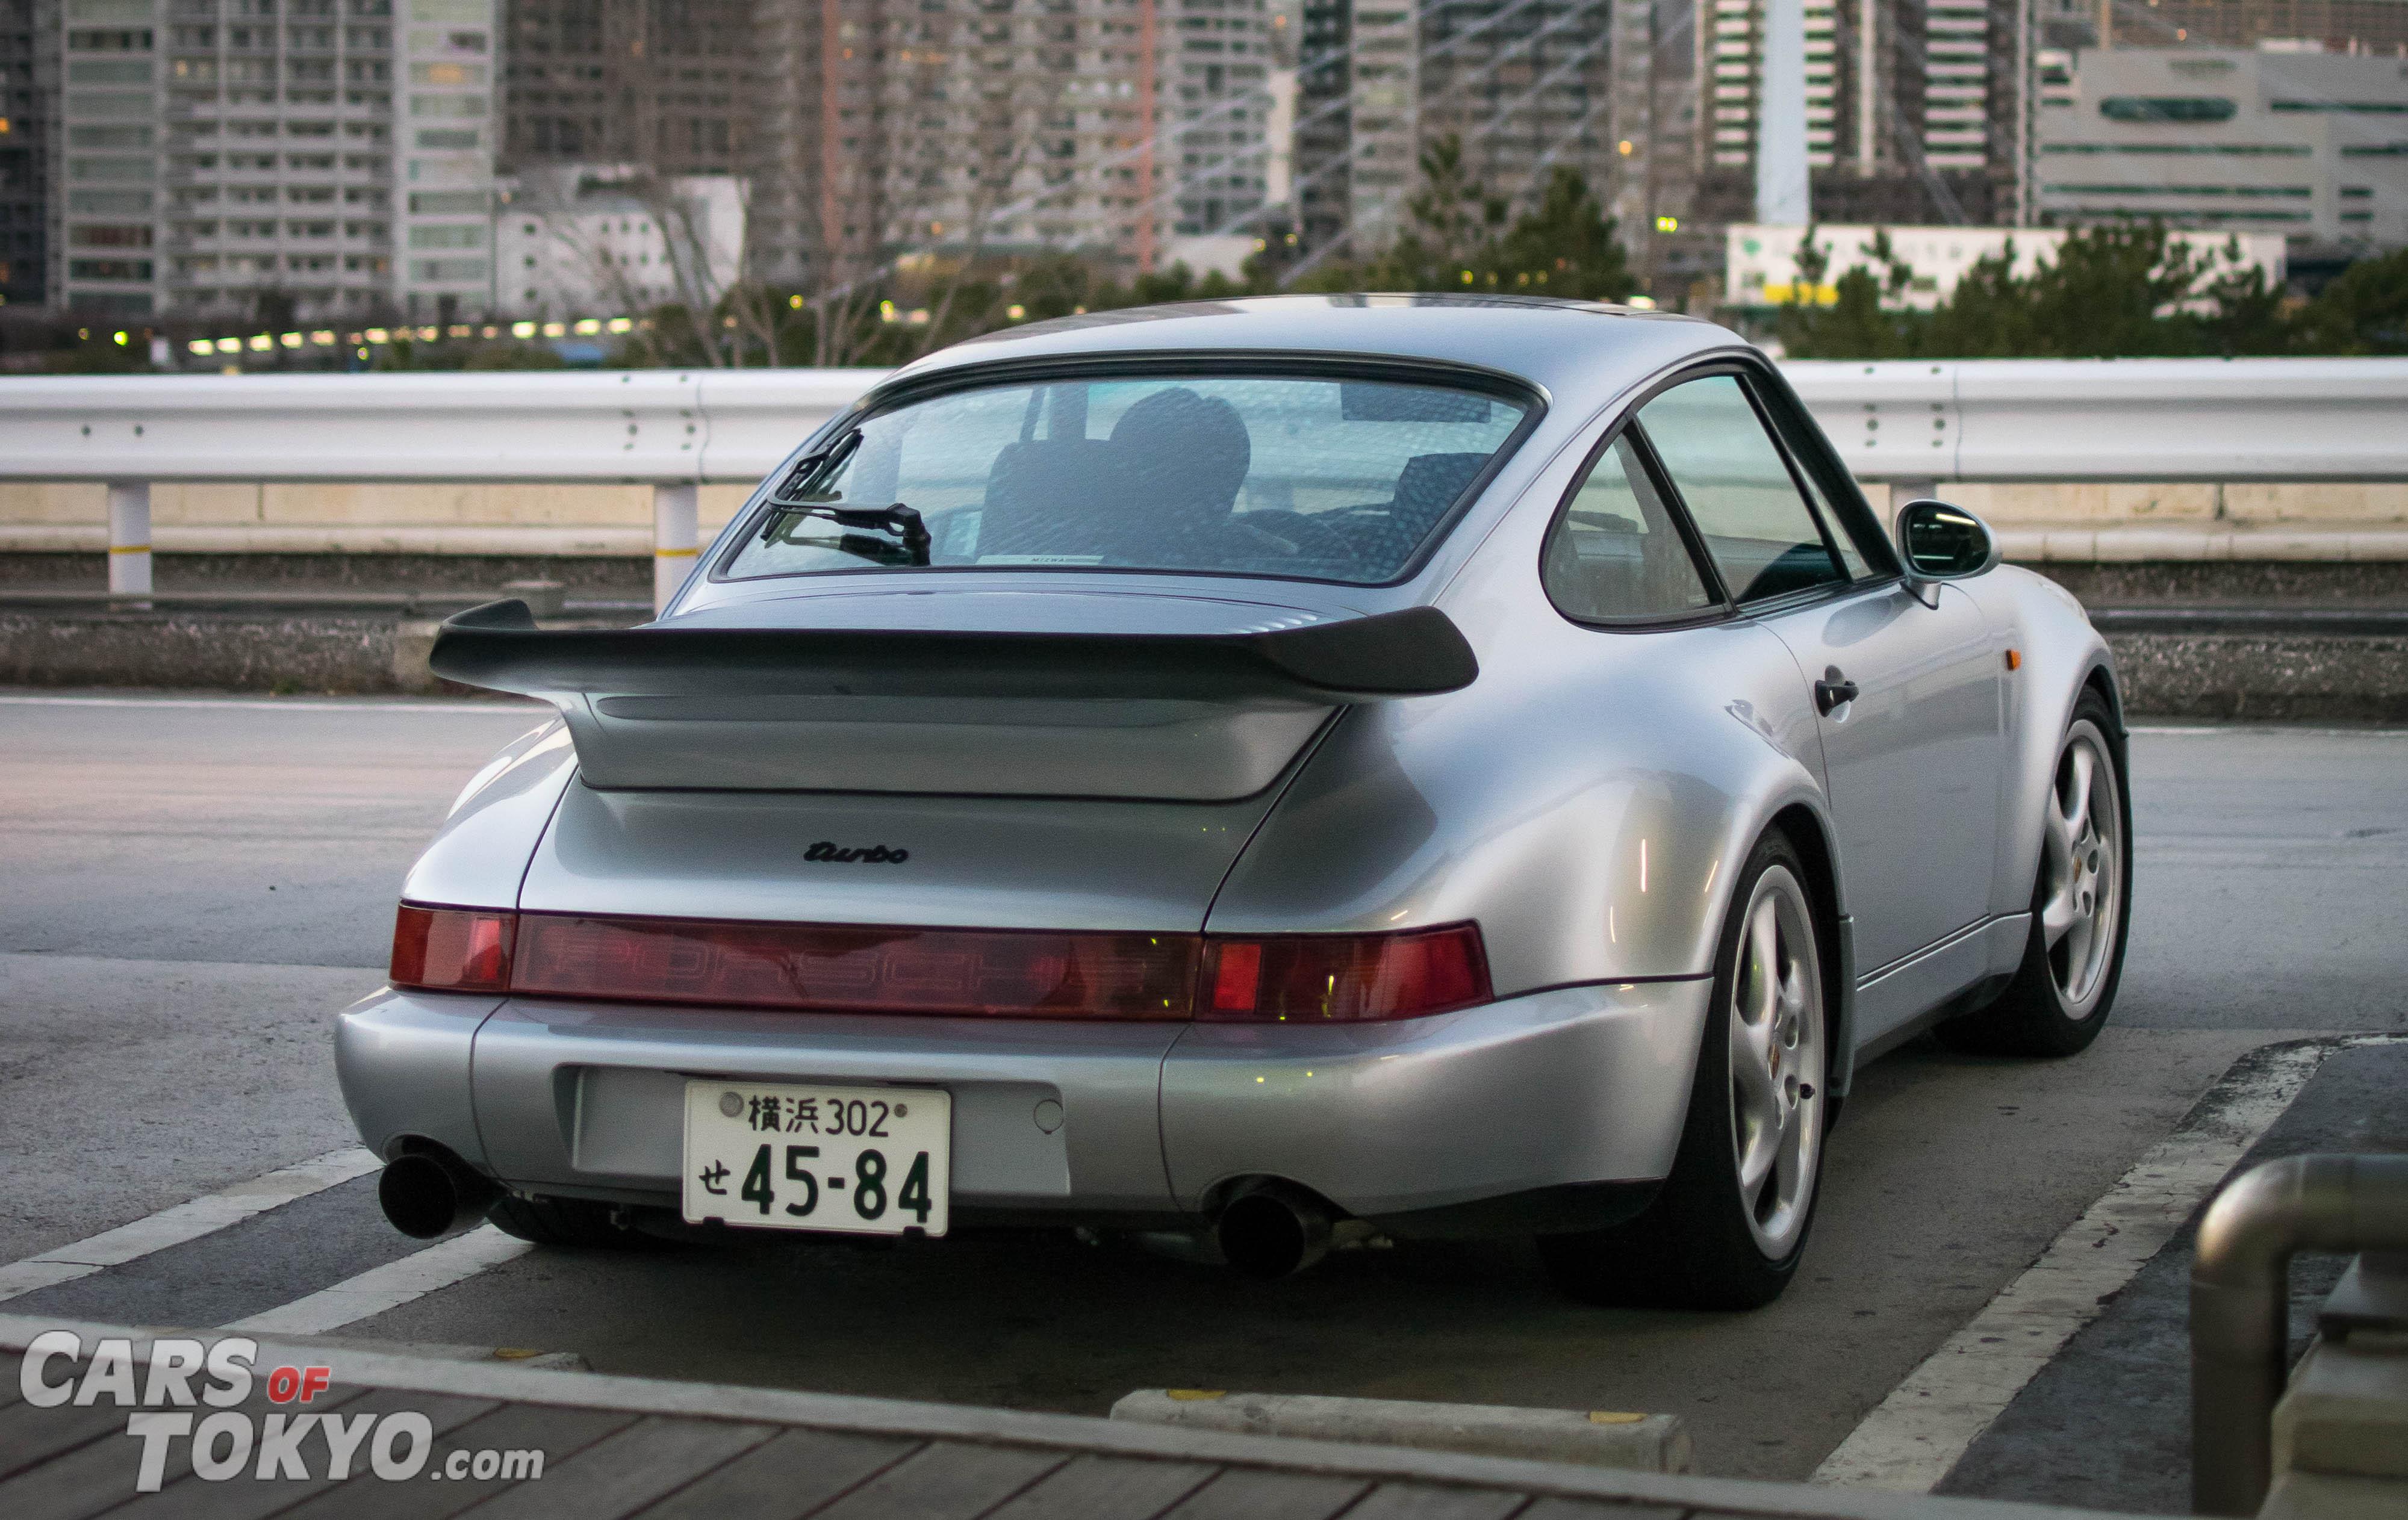 Cars of Tokyo Porsche 911 Turbo 964